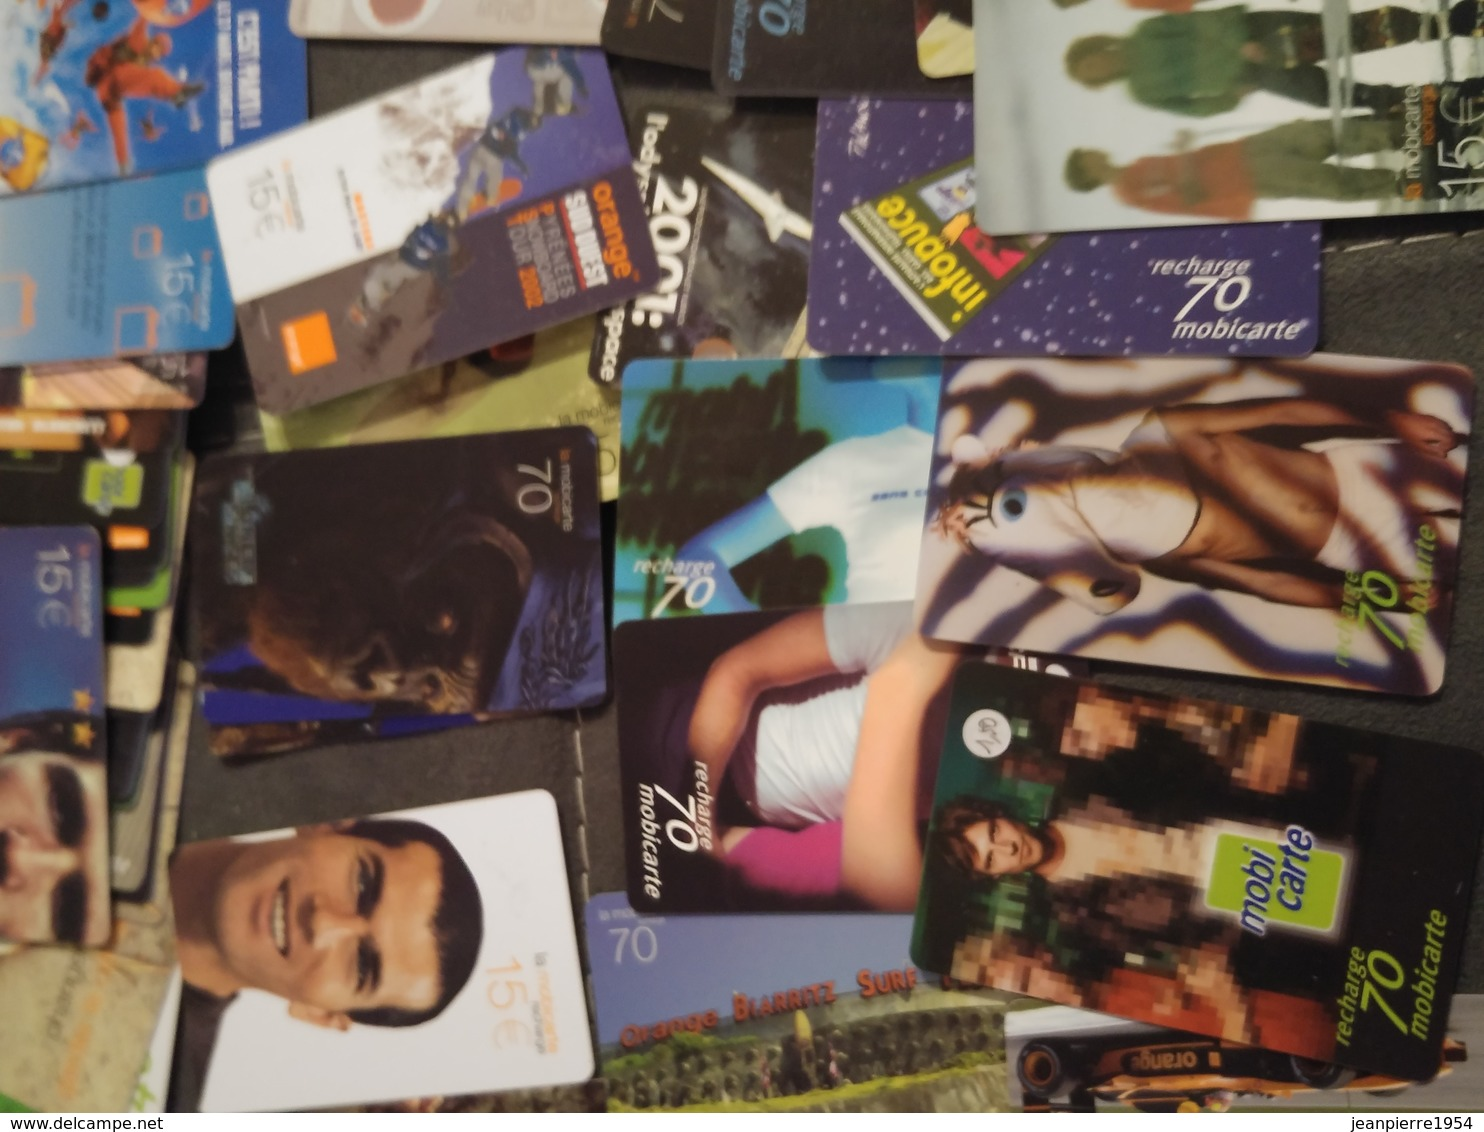 Mobicartes - Phonecards